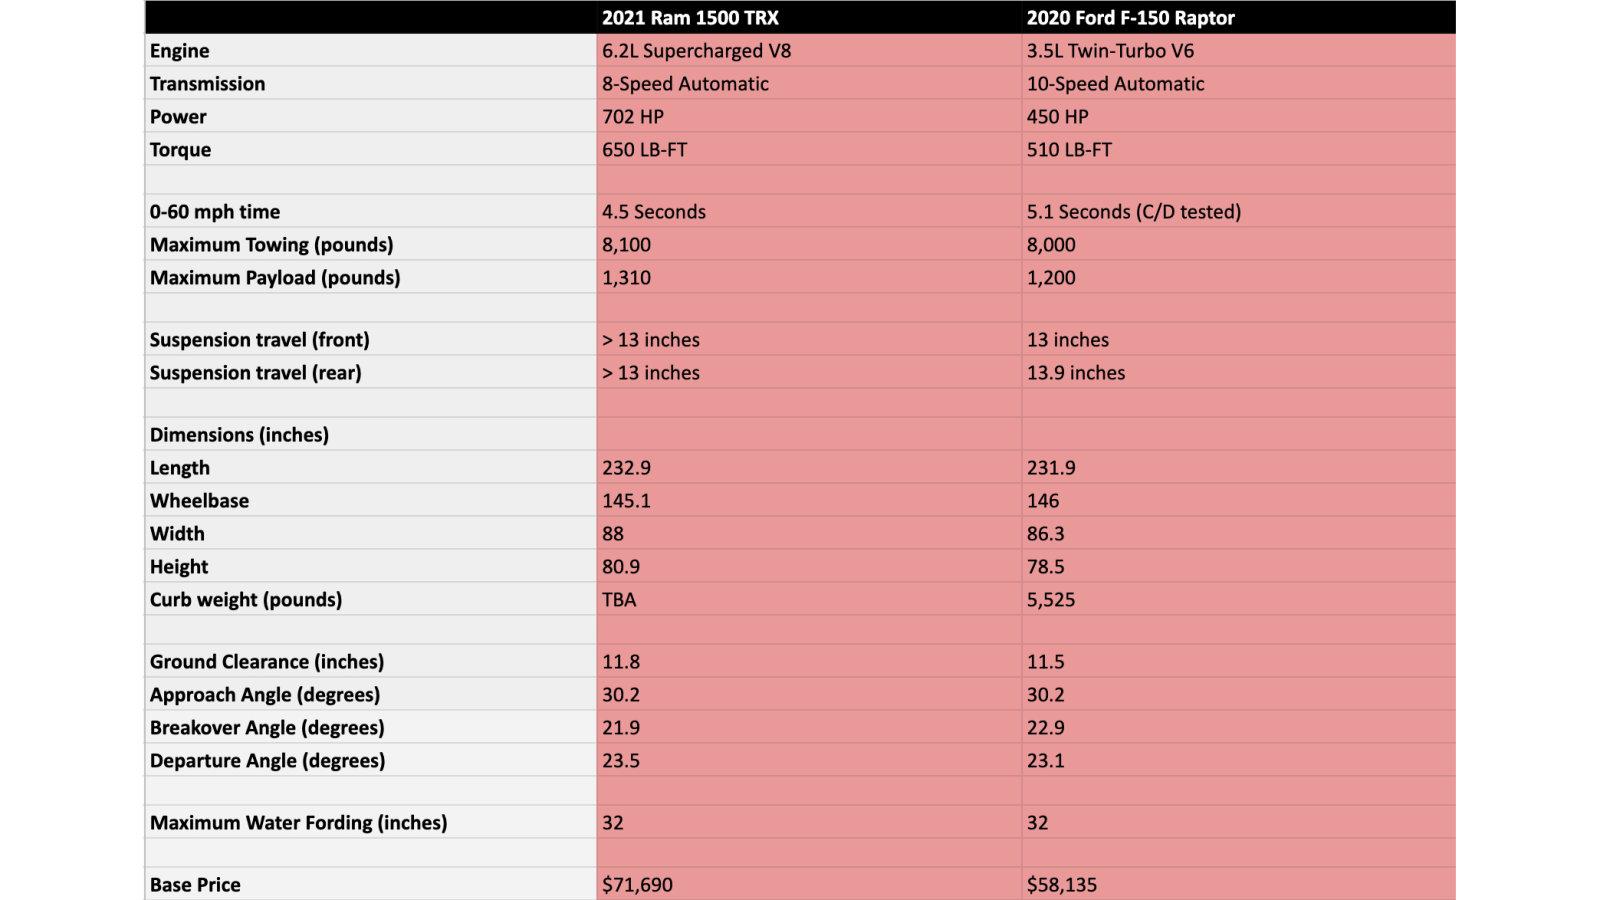 2021 Ram 1500 TRX vs. 2020 Ford F-150 Raptor Off-road vehicle comparo